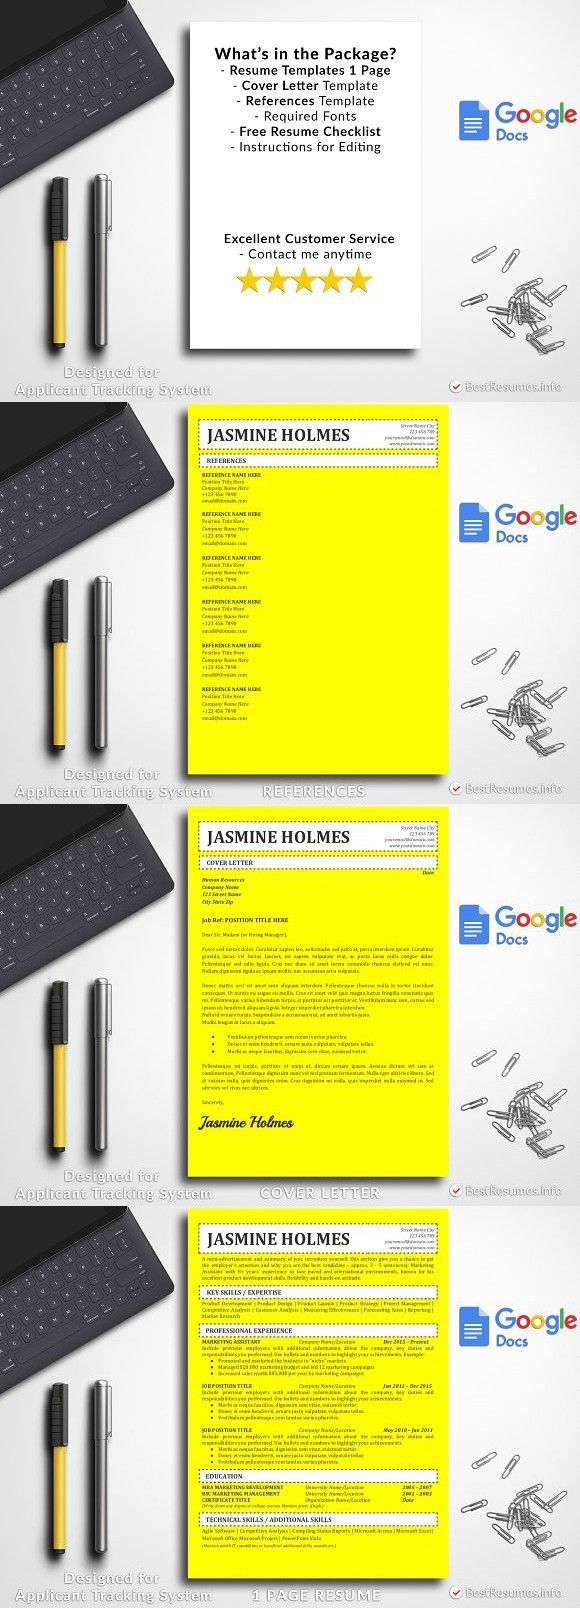 Simple Resume Template Google Docs Simple resume